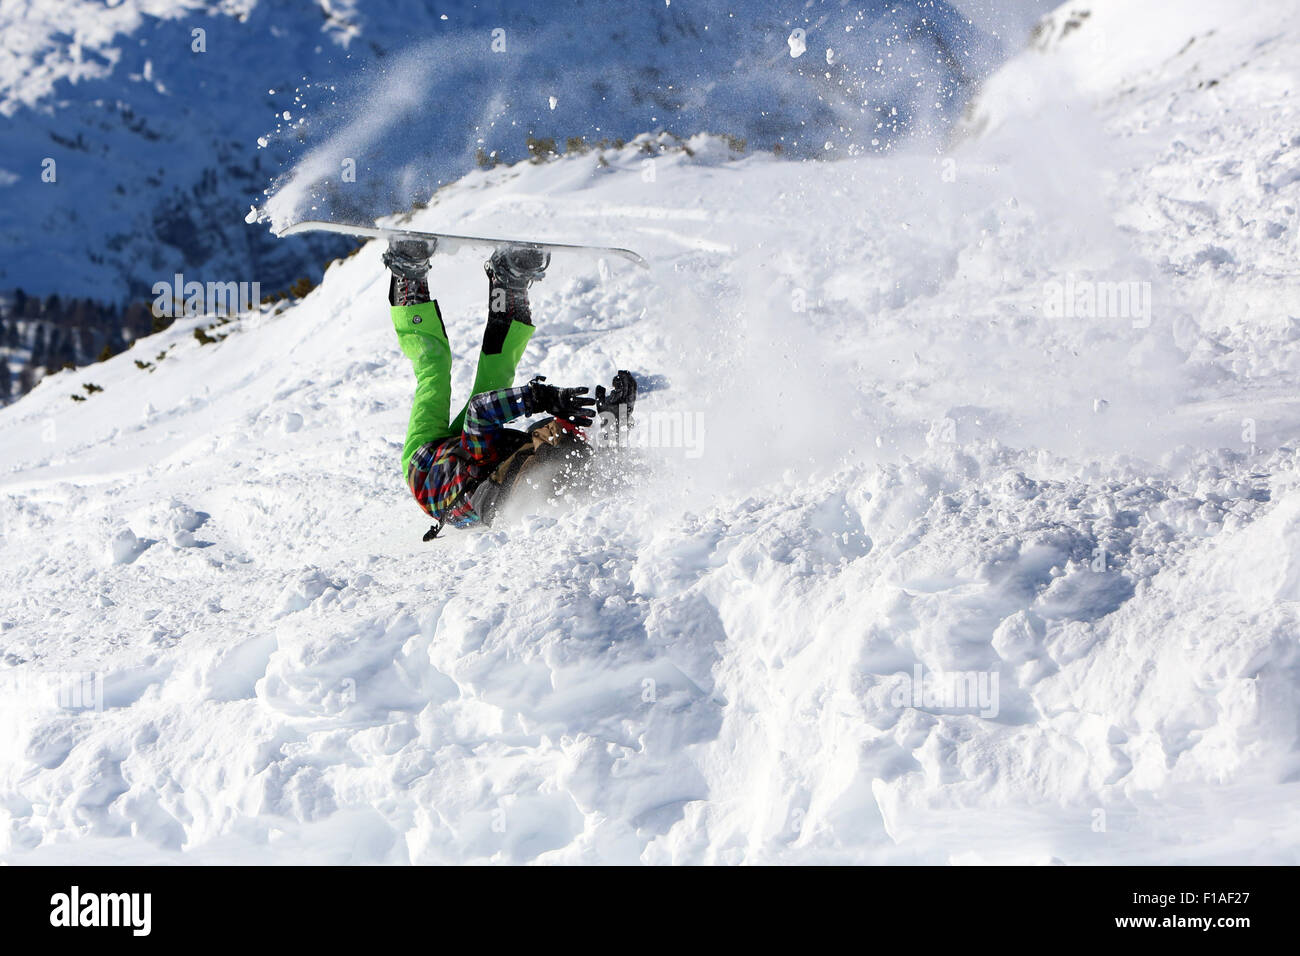 Krippenbrunn, Austria, a boy crashes while snowboarding Stock Photo